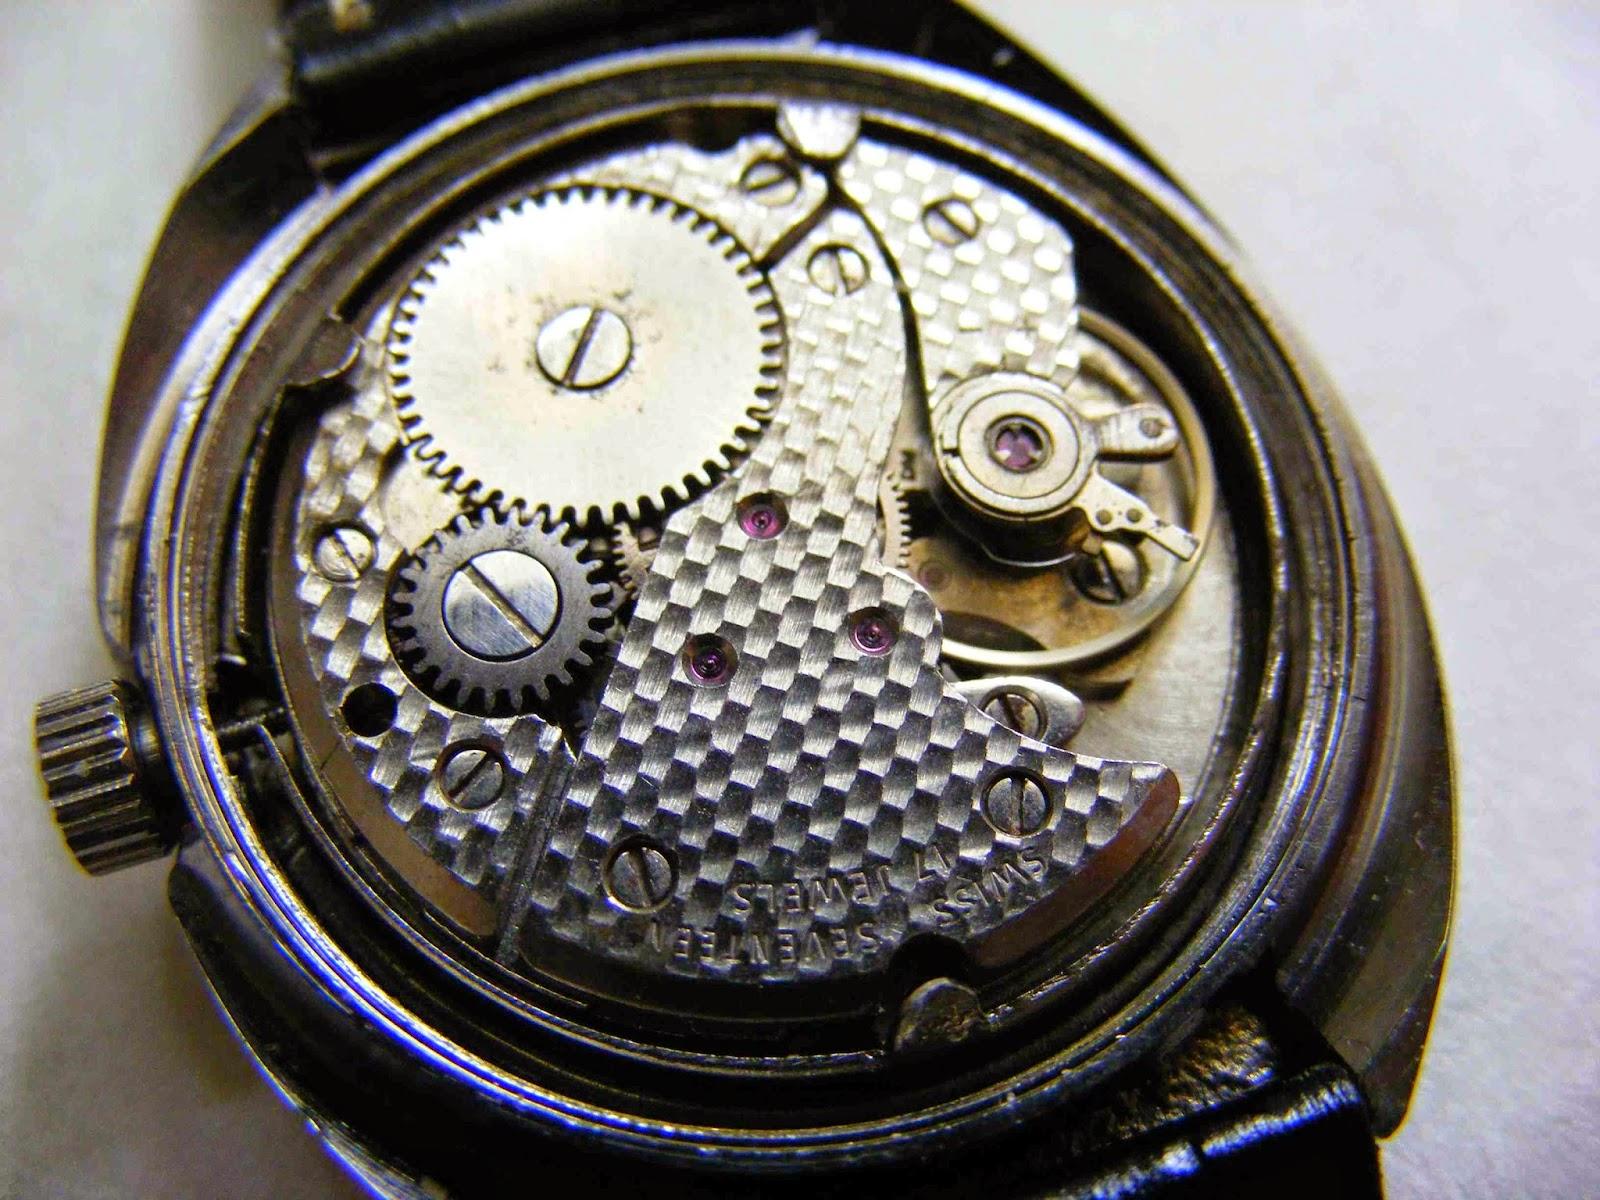 vintage mechanical watch handwind lanco inside